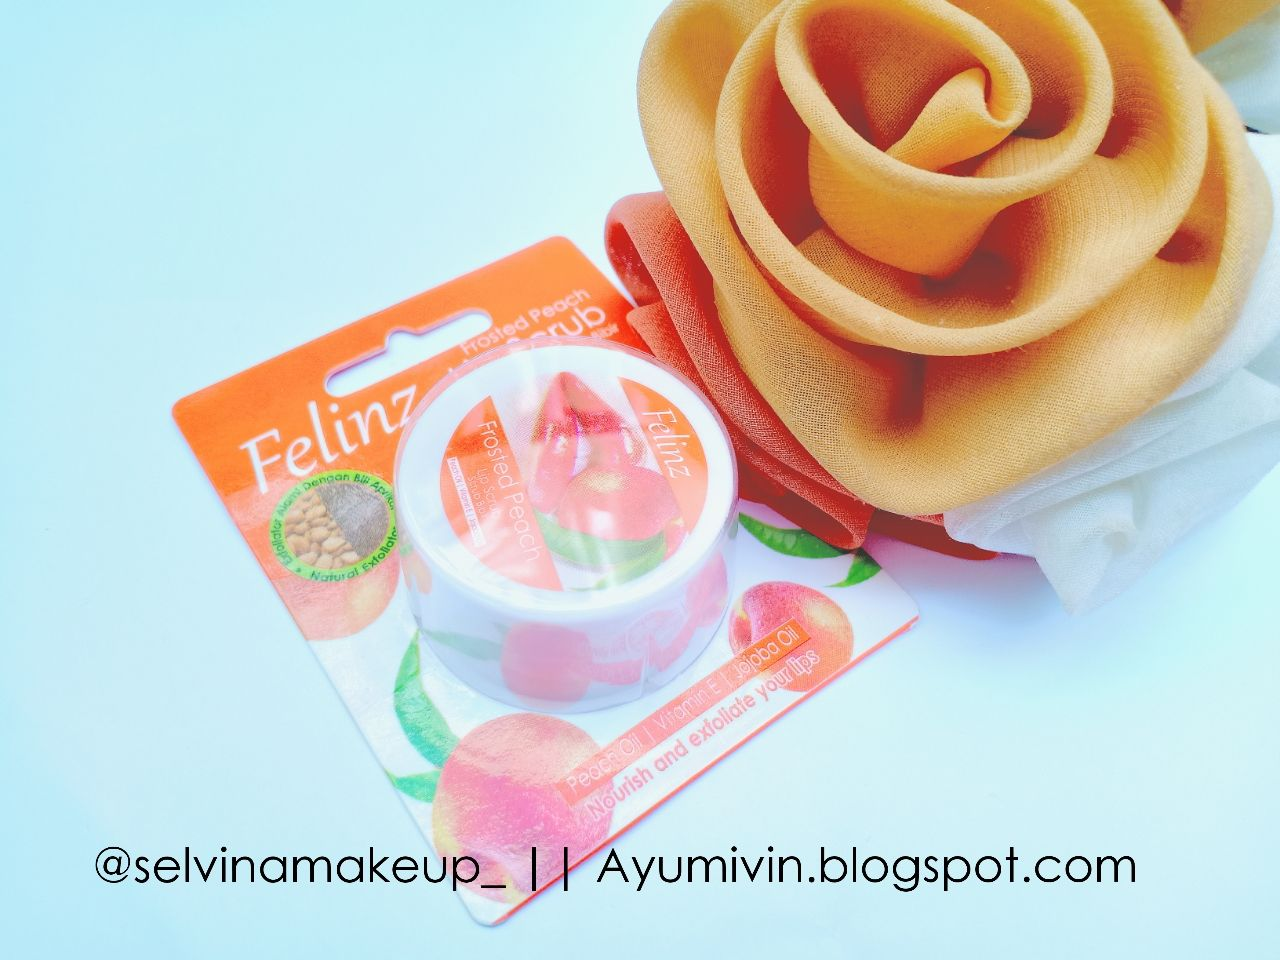 gambar review ke-7 untuk Felinz Lip Scrub Frosted Peach